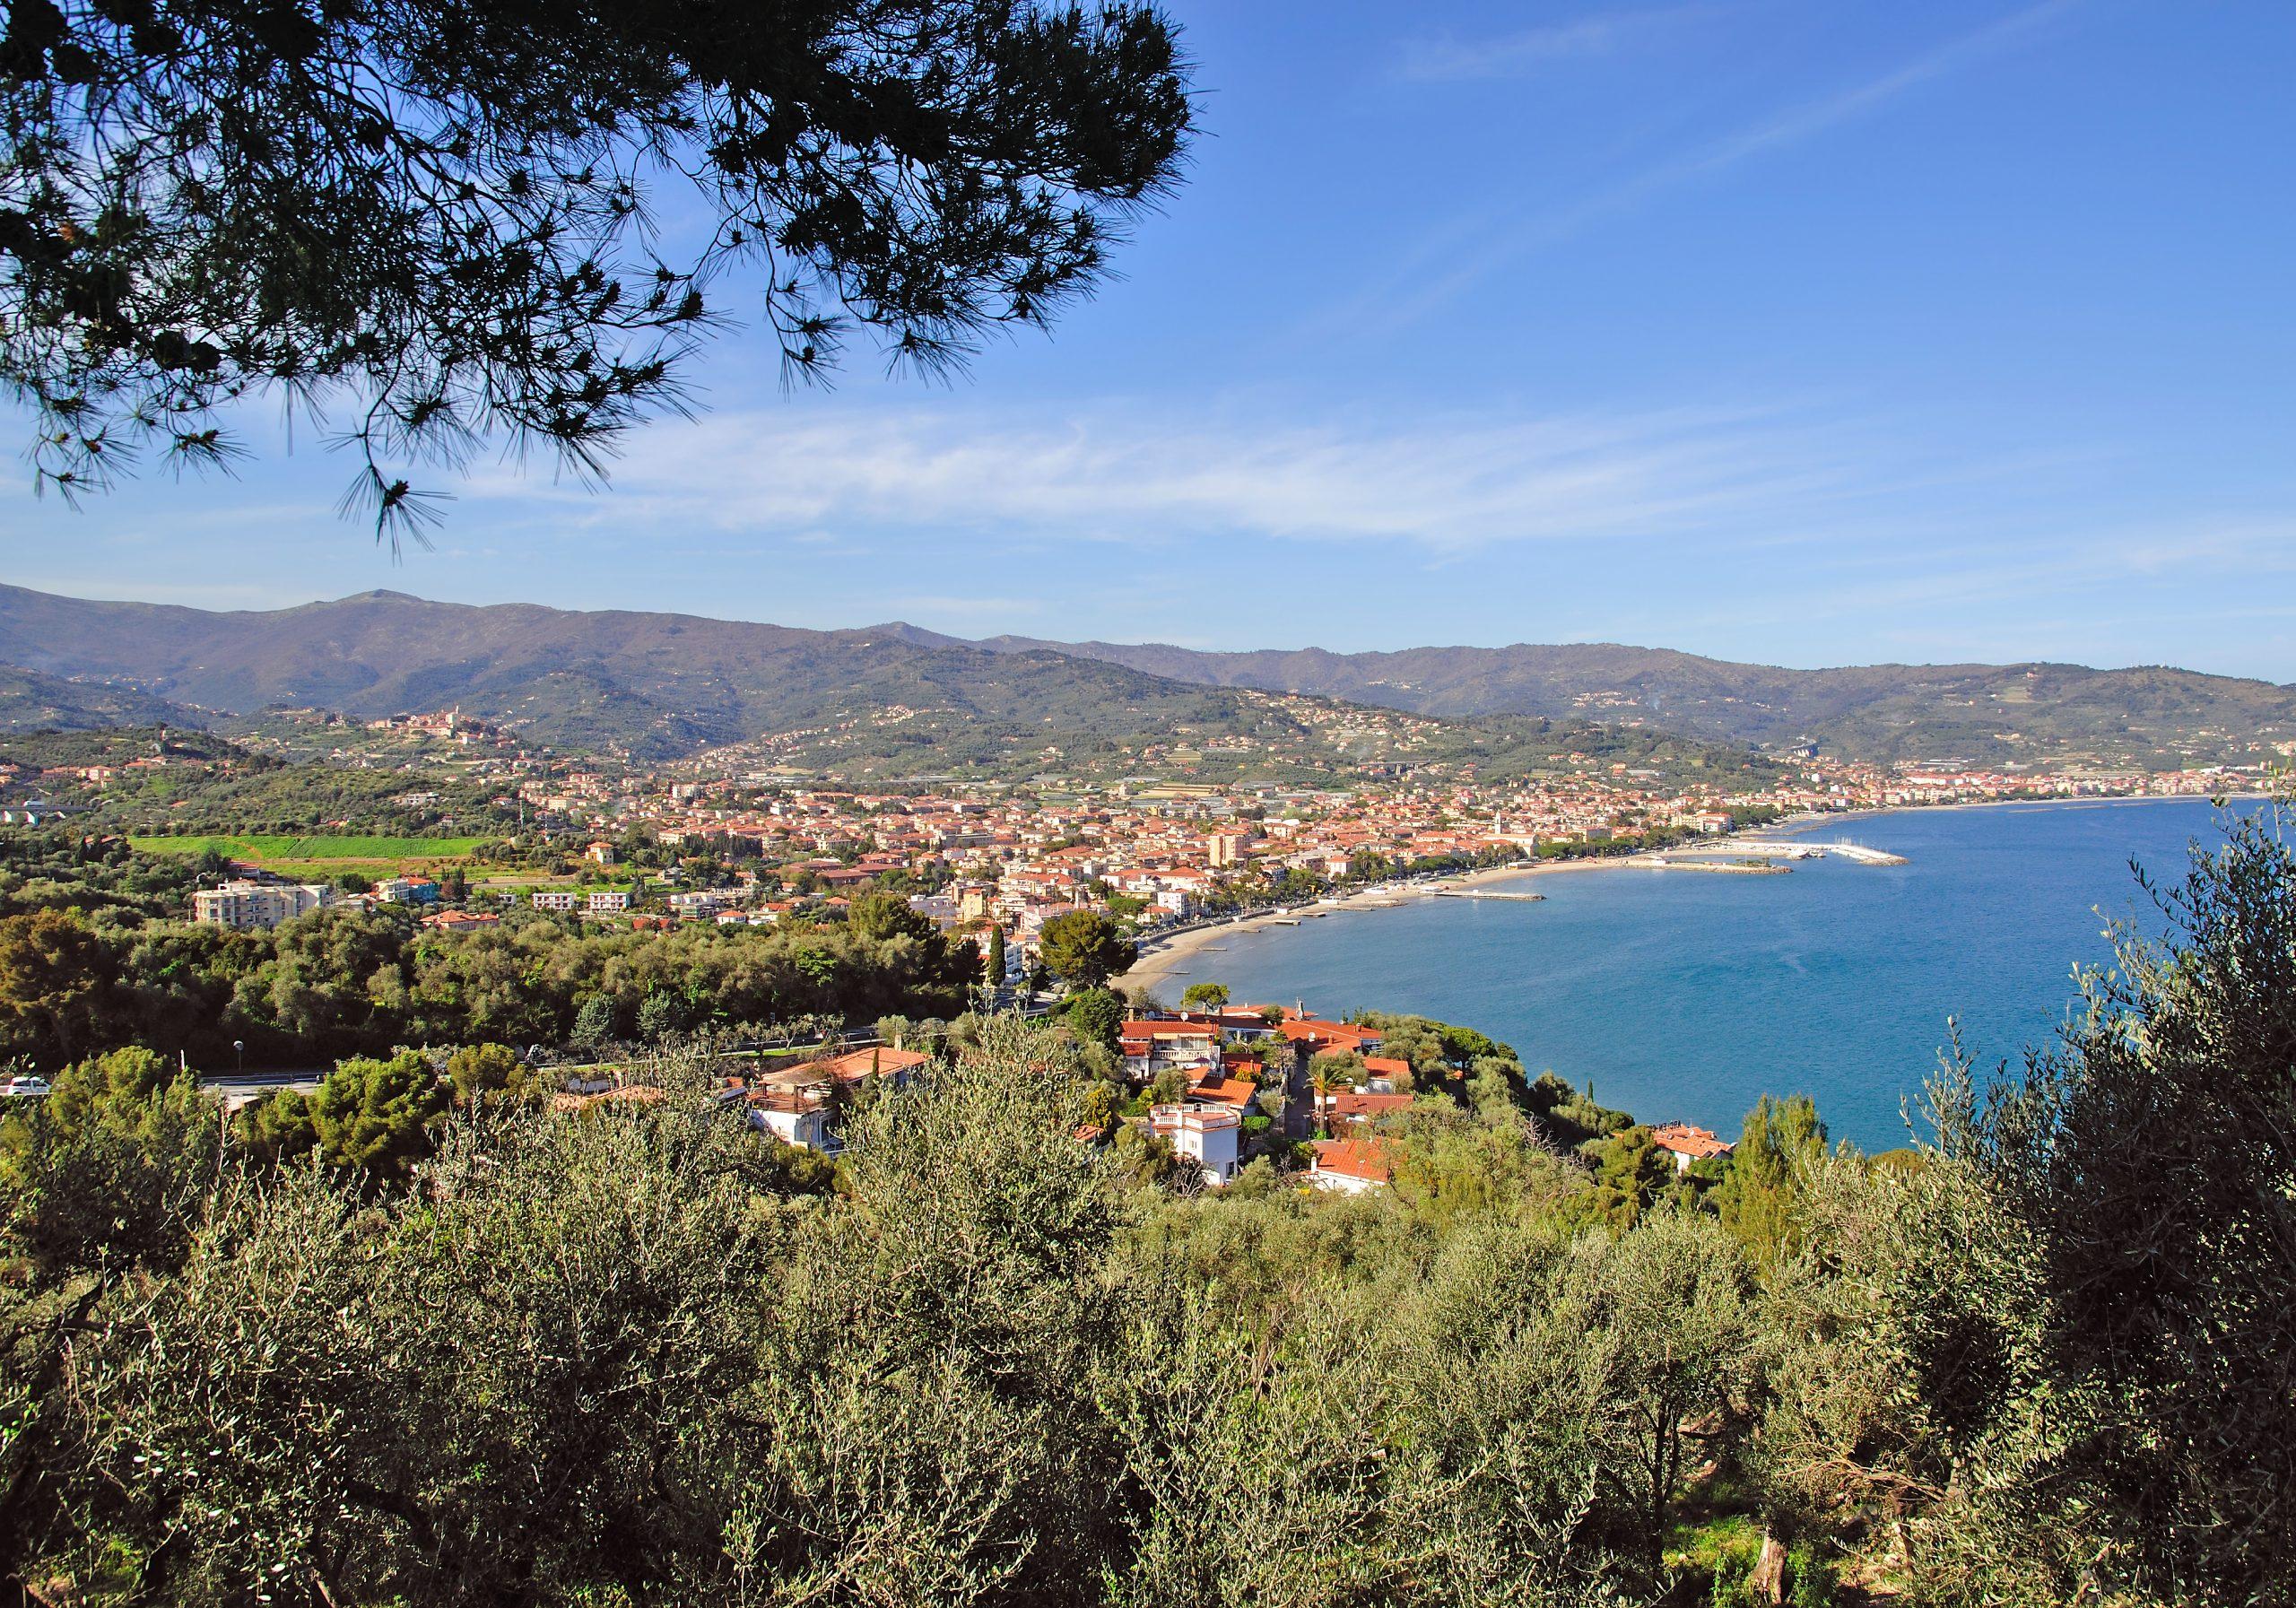 Widok na Diano Marina,Liguria, Włochy, fot. shutterstock.com